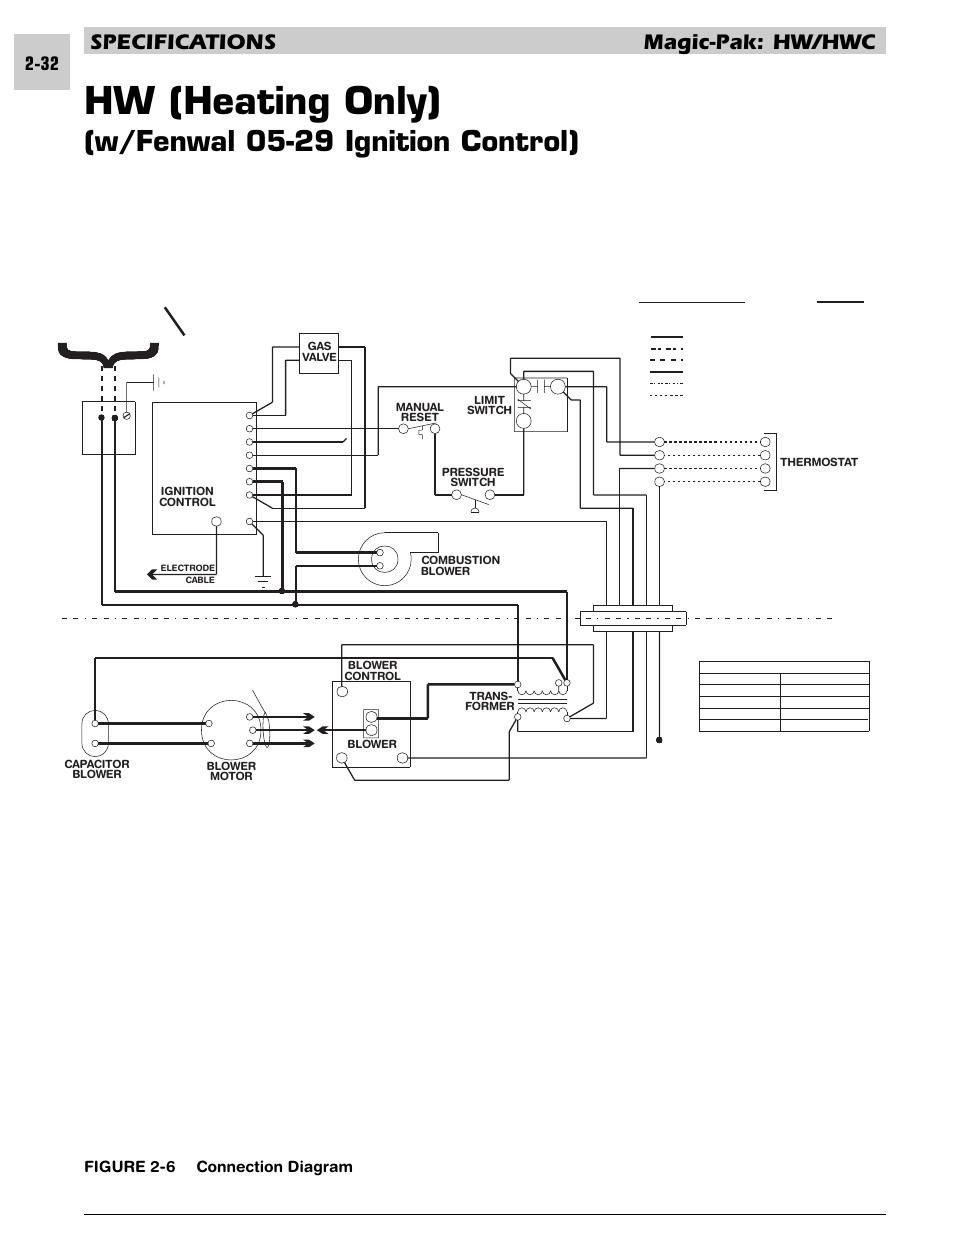 Hw (heating only), W/fenwal 05-29 ignition control